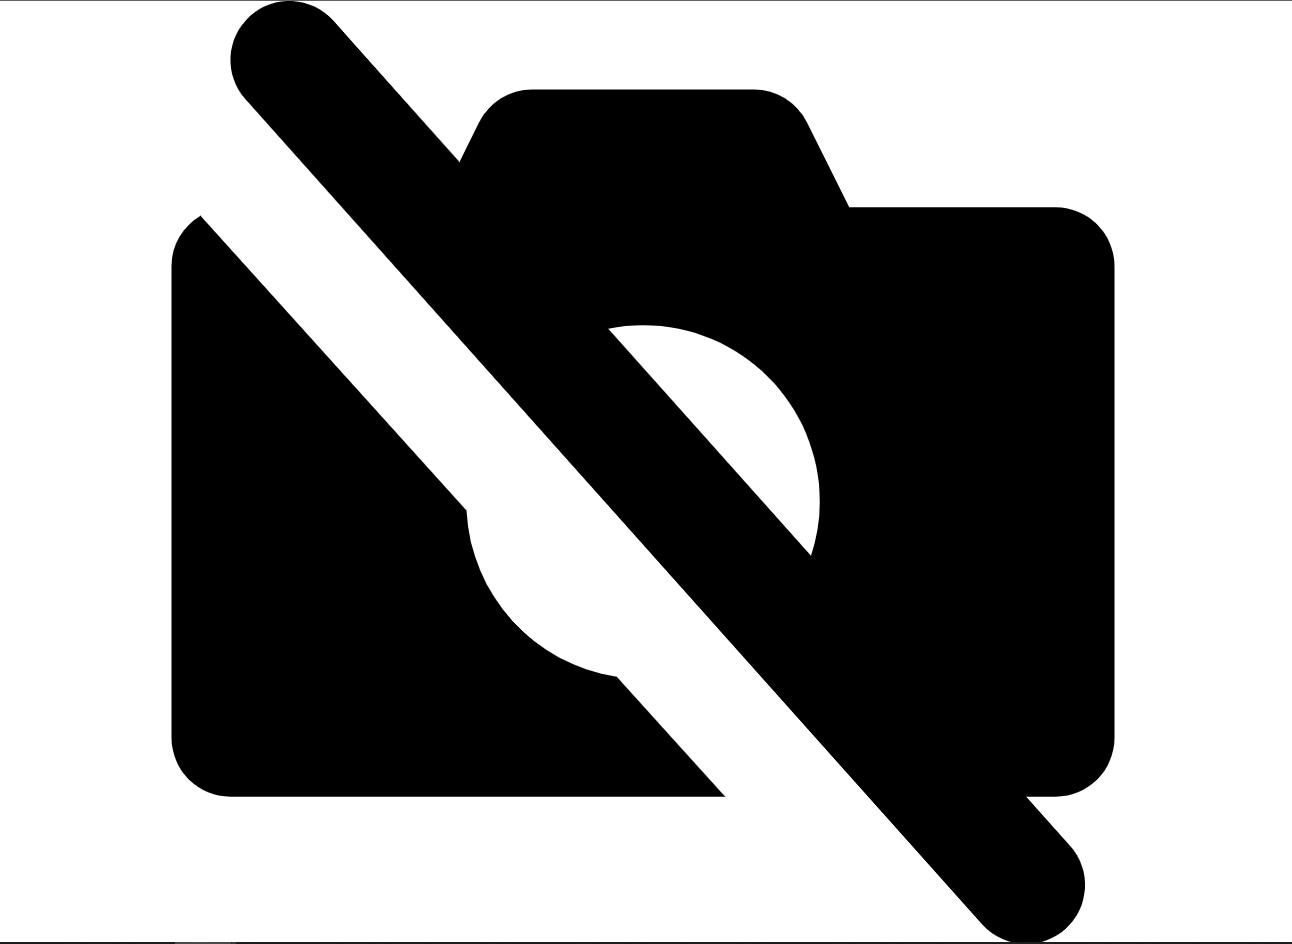 Kit Pis/anel Metal Leve Tur/ml/xl125 1.00 1367